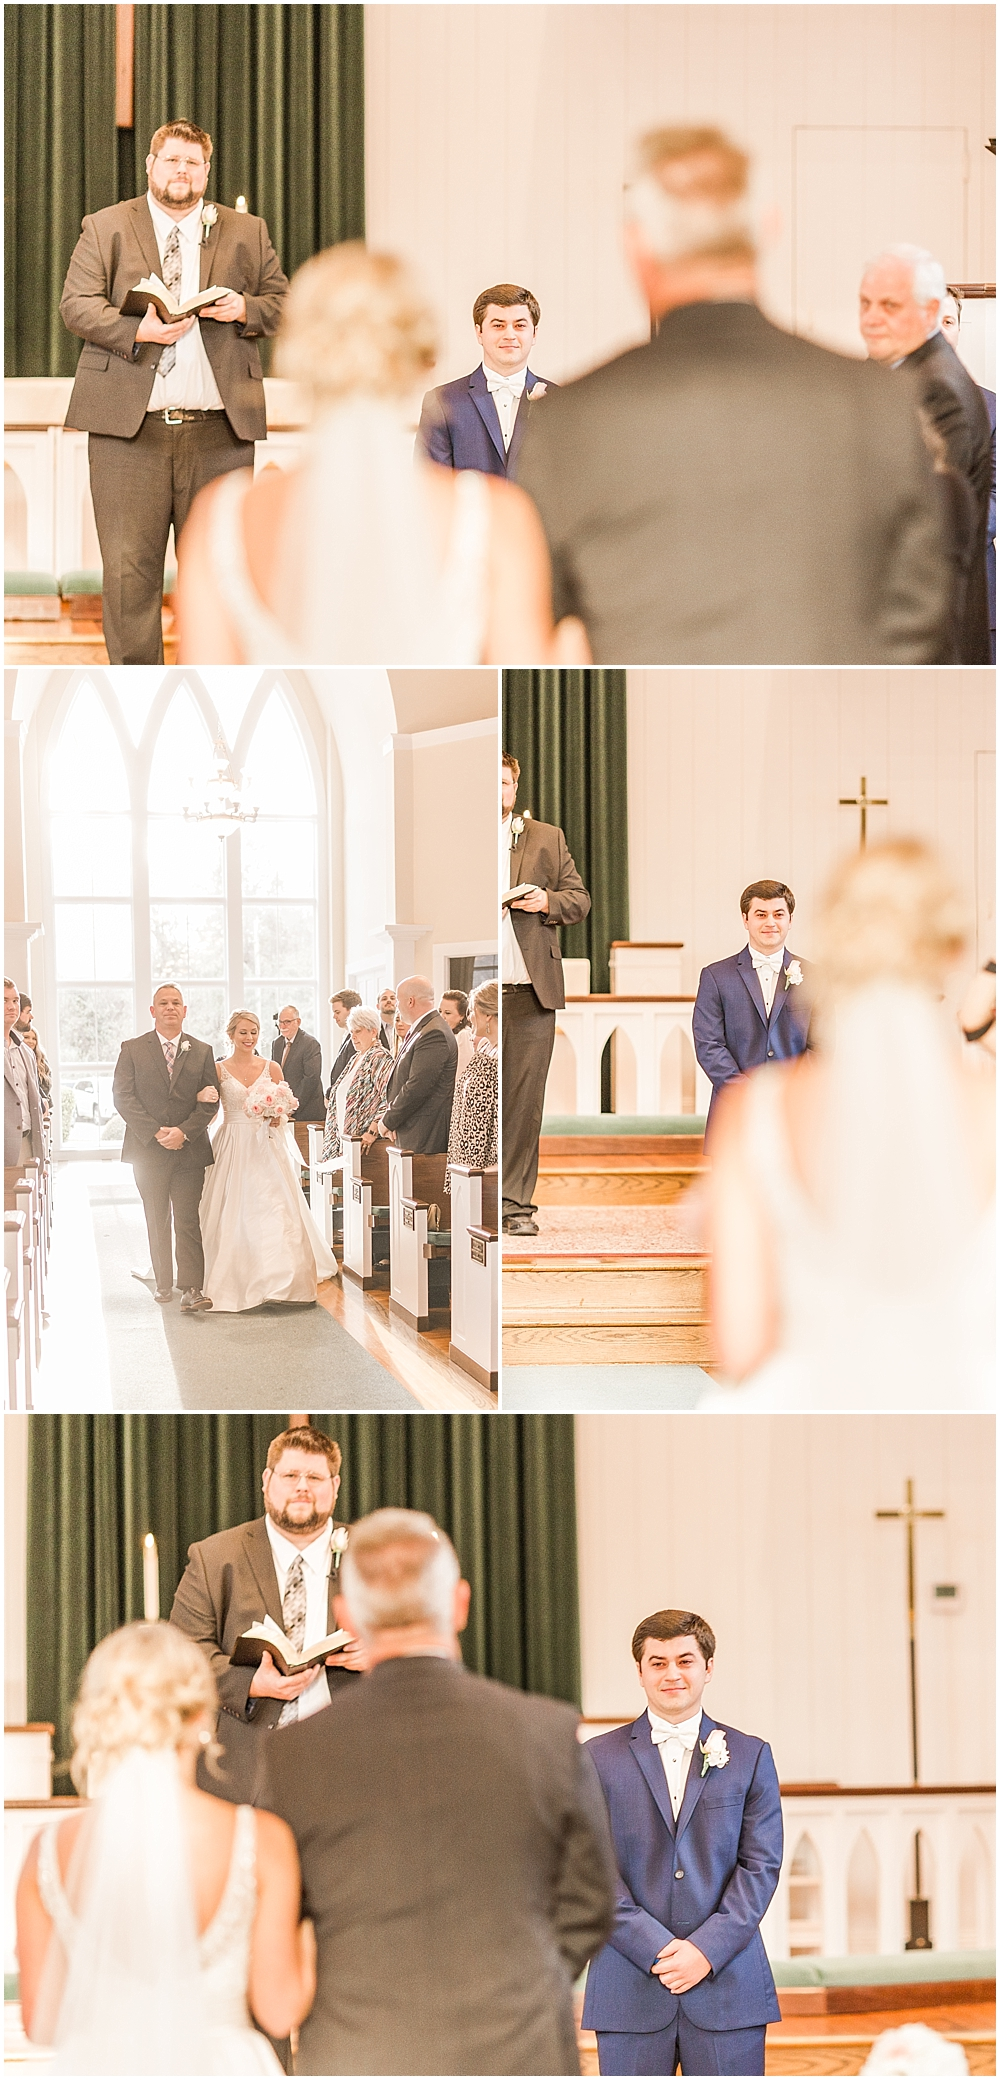 Ashton-Clark-Photography-Wedding-Portrait-Family-Photographer-Mobile-Alabama_0326.jpg